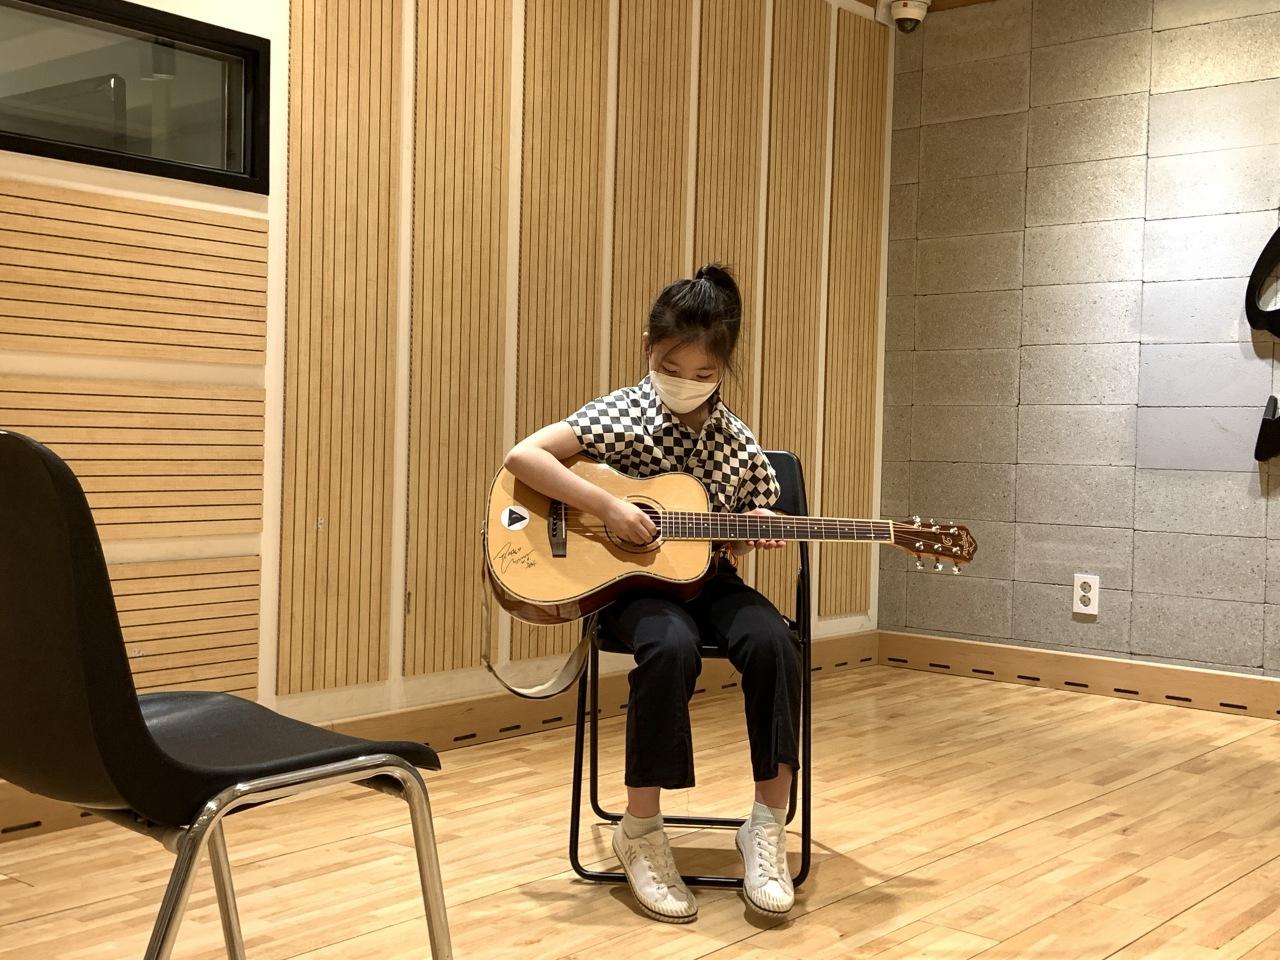 Idol-wannabe Woo Seo-yul plays the guitar. (Park Jun-hee/The Korea Herald)